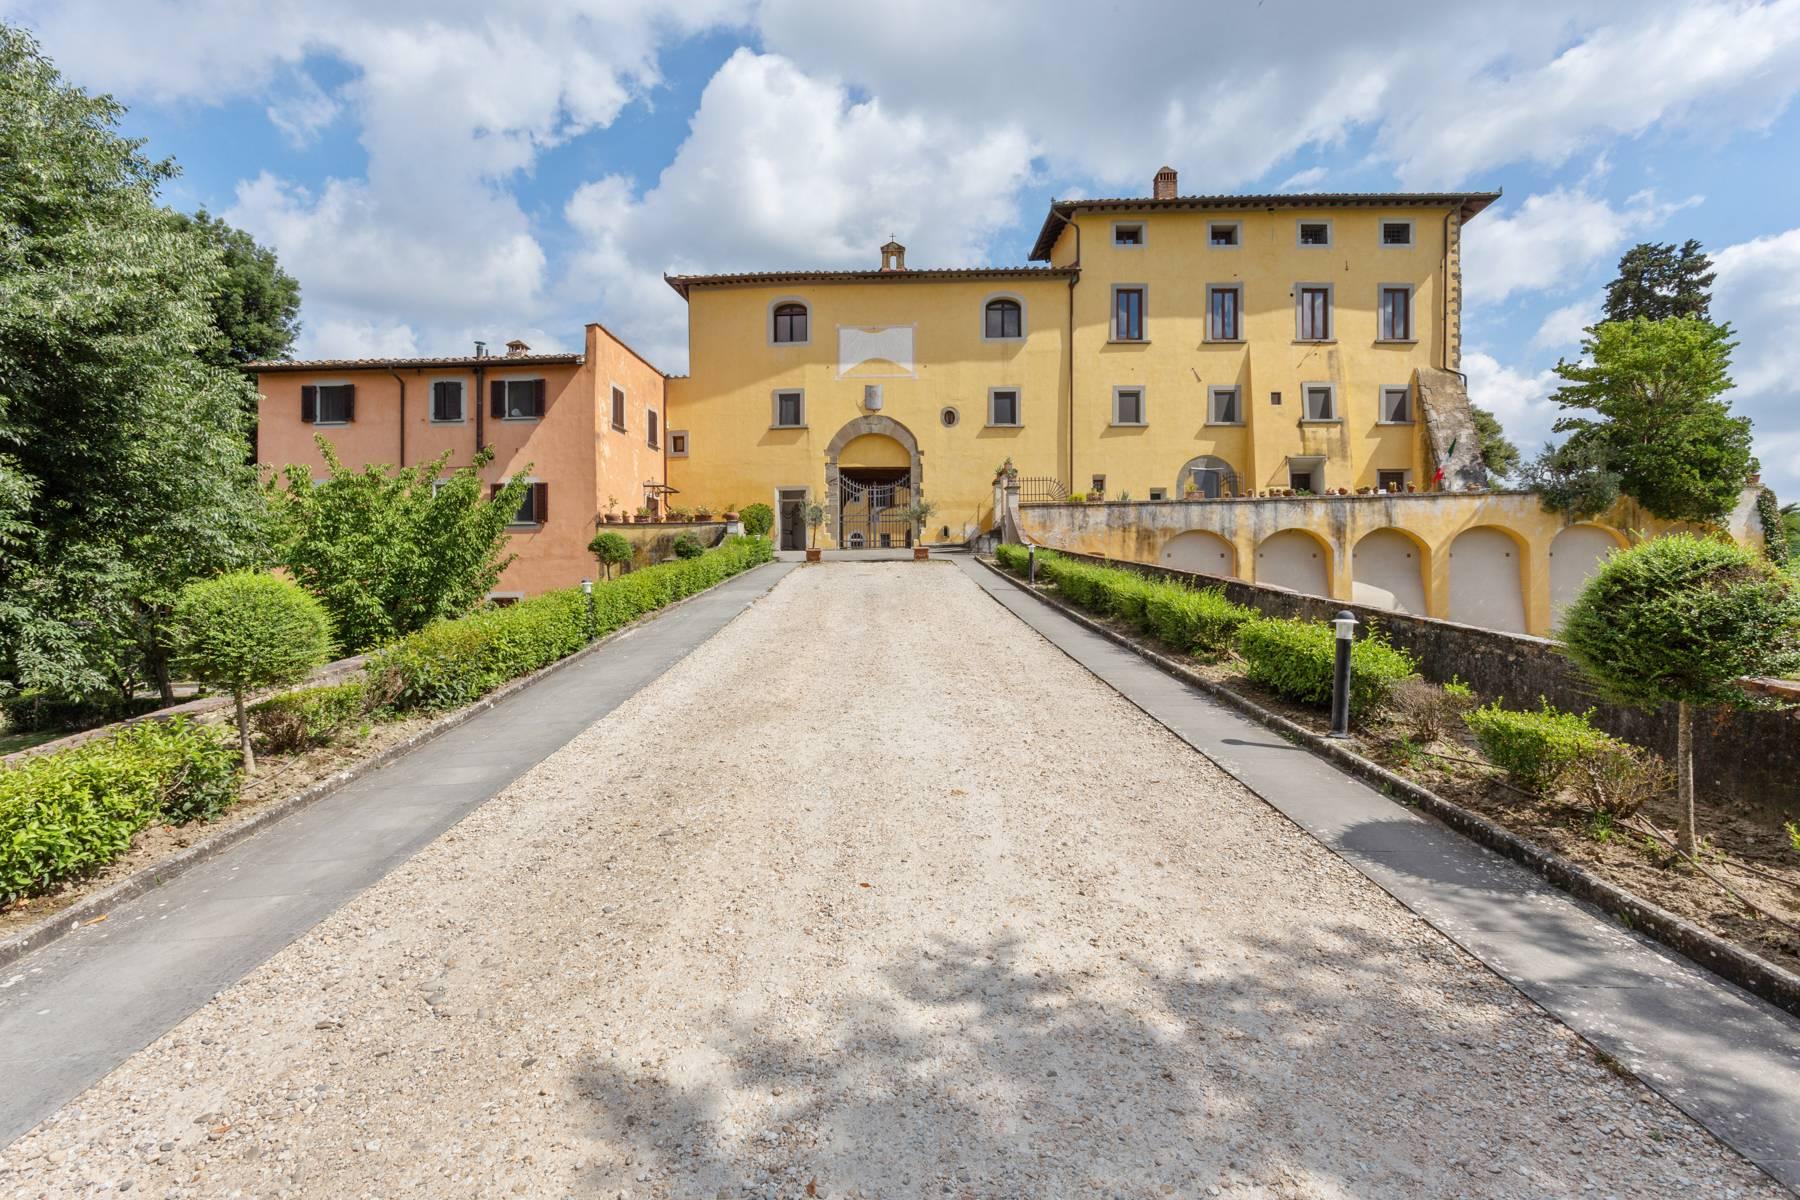 Appartamento in Vendita a Scandicci: 5 locali, 140 mq - Foto 19